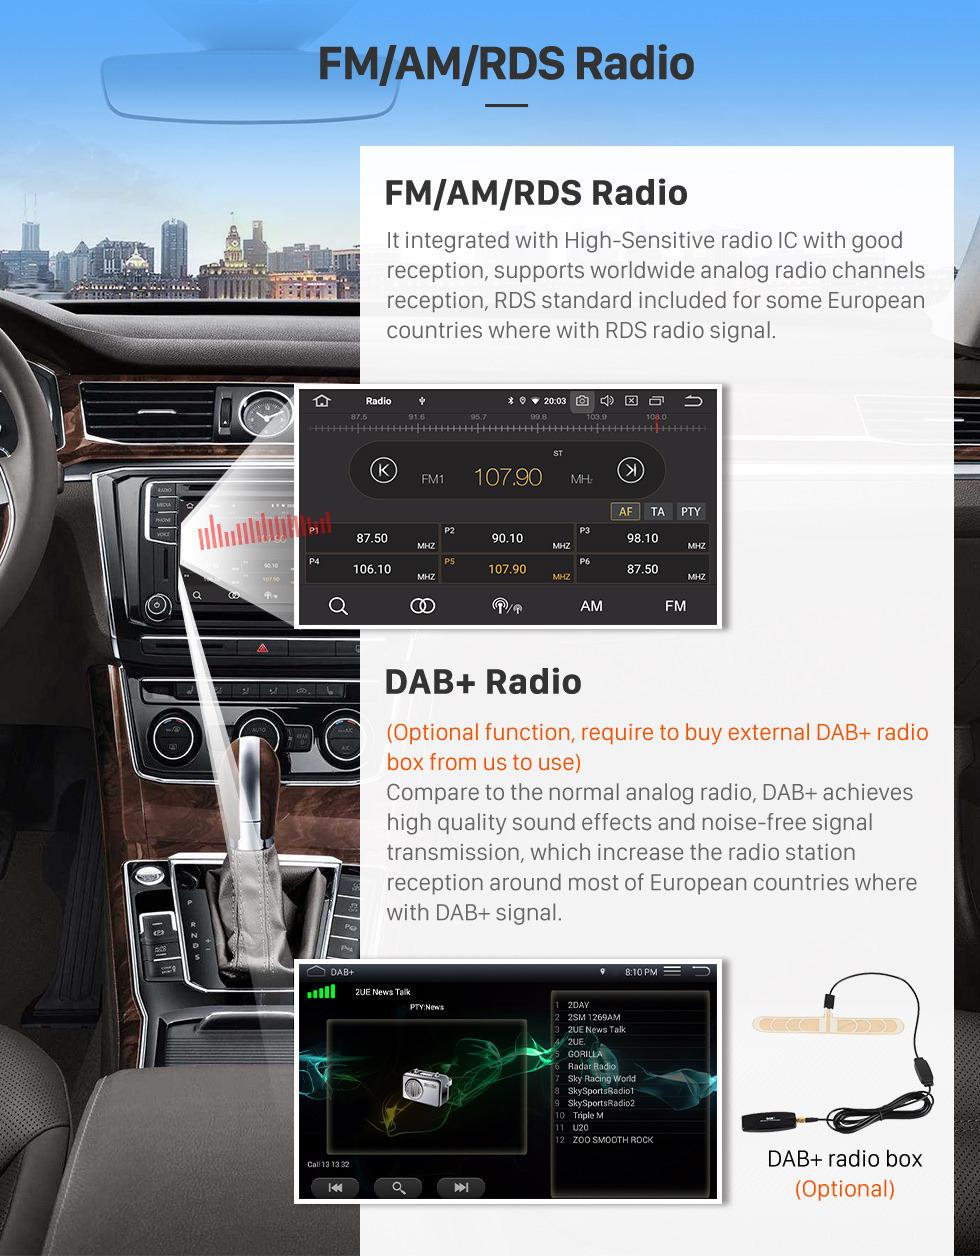 Seicane 9 inch 2015 2016 Kia Sorento Android 9.0 Radio bluetooth GPS Navigation System with Backup Camera TPMS Steering Wheel Control Mirror link OBD2 DVR Rearview camera digital TV